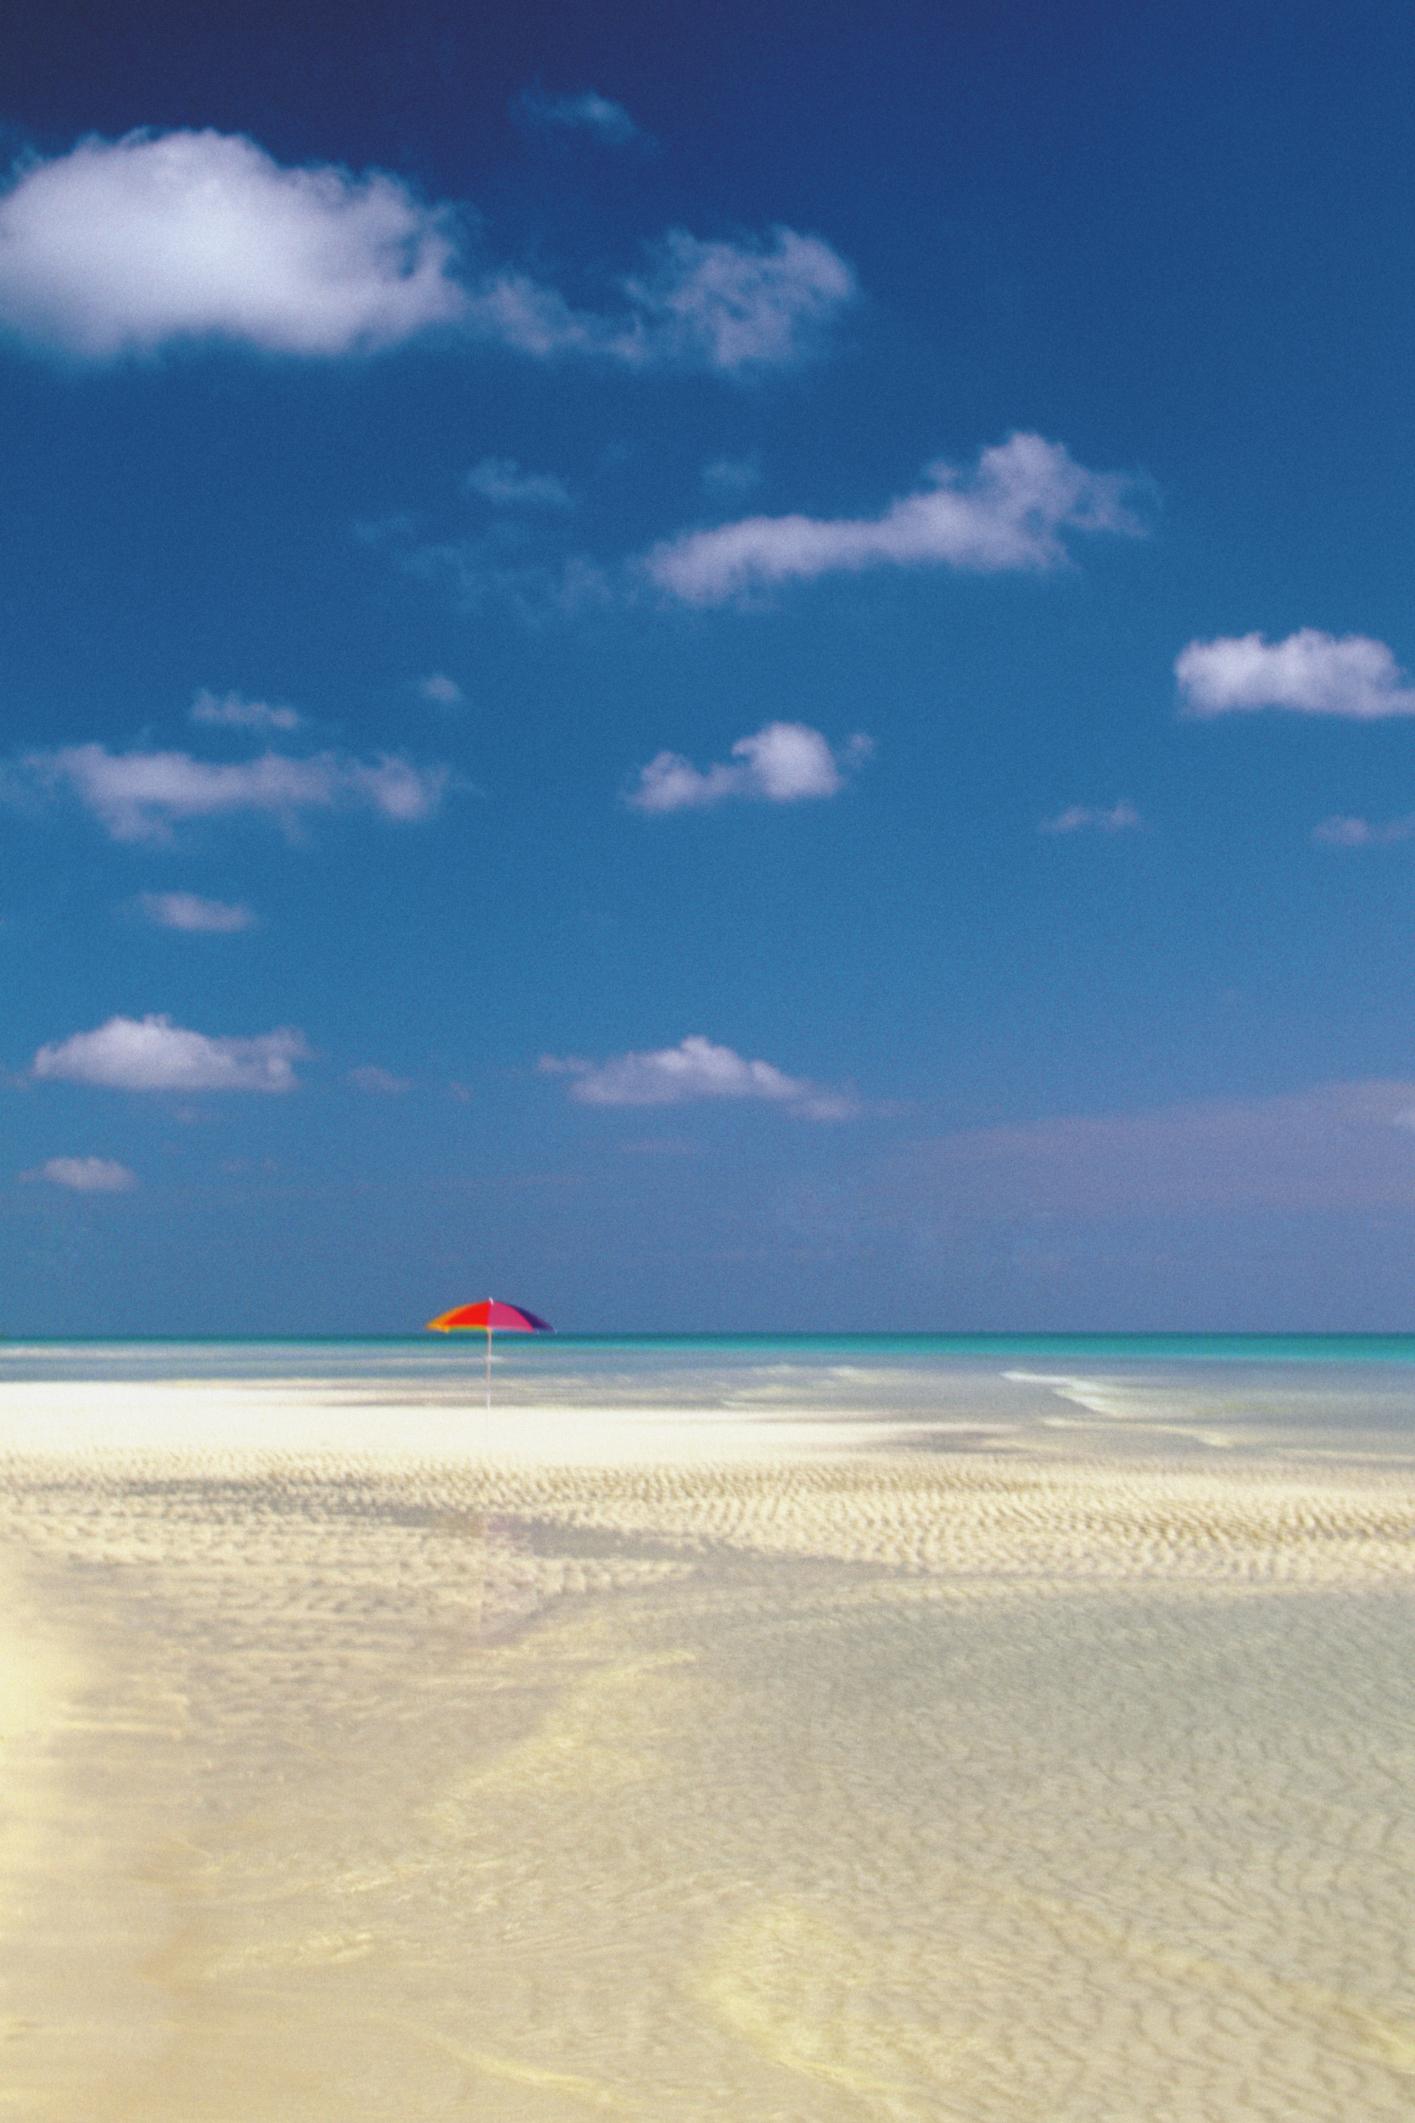 how far is the flight from orlando, fl to nassau, bahamas